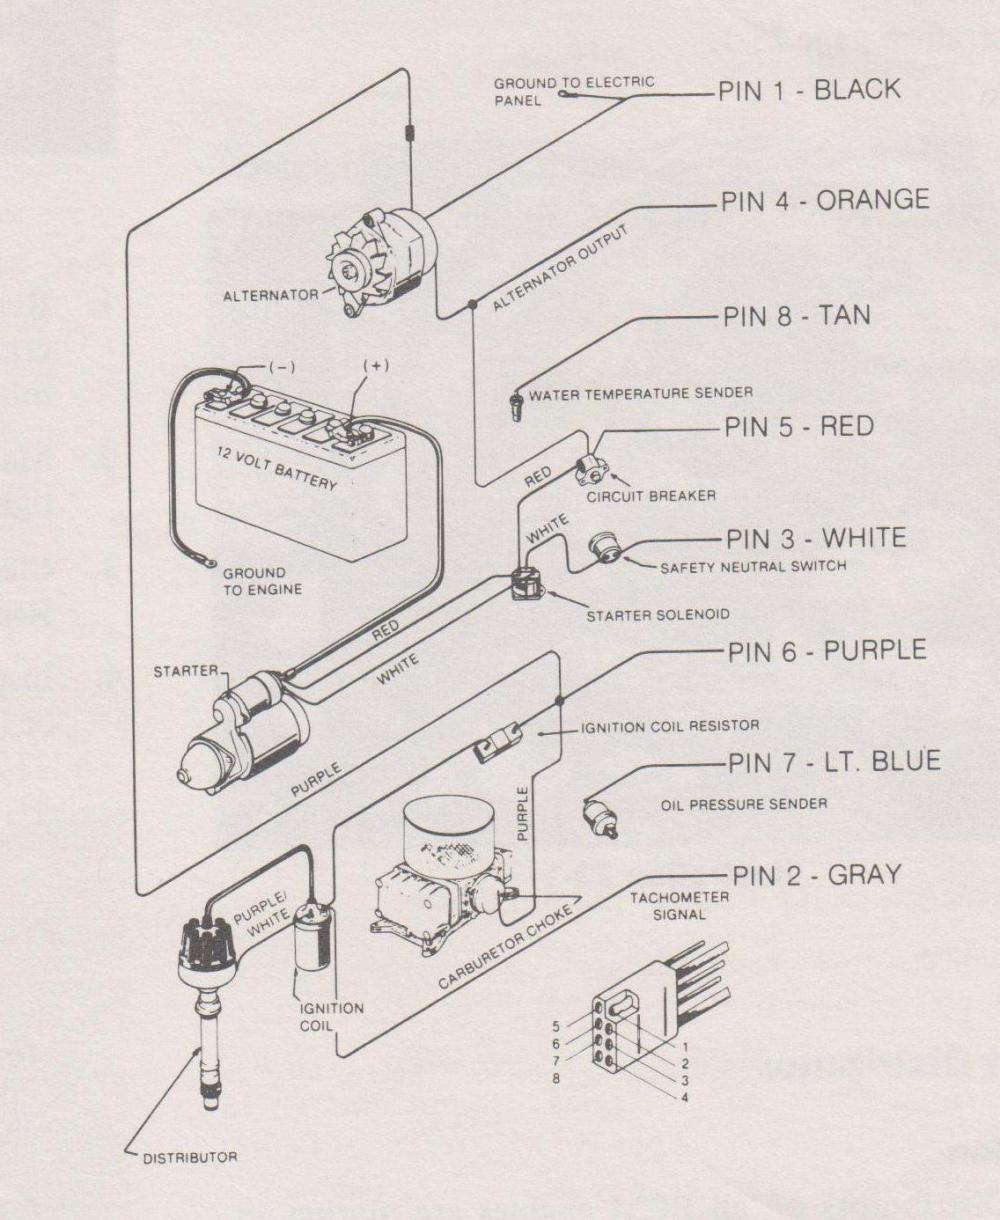 medium resolution of 2000 kia rio engine diagram wiring librarykia pride engine plug diagram wiring diagram u2022